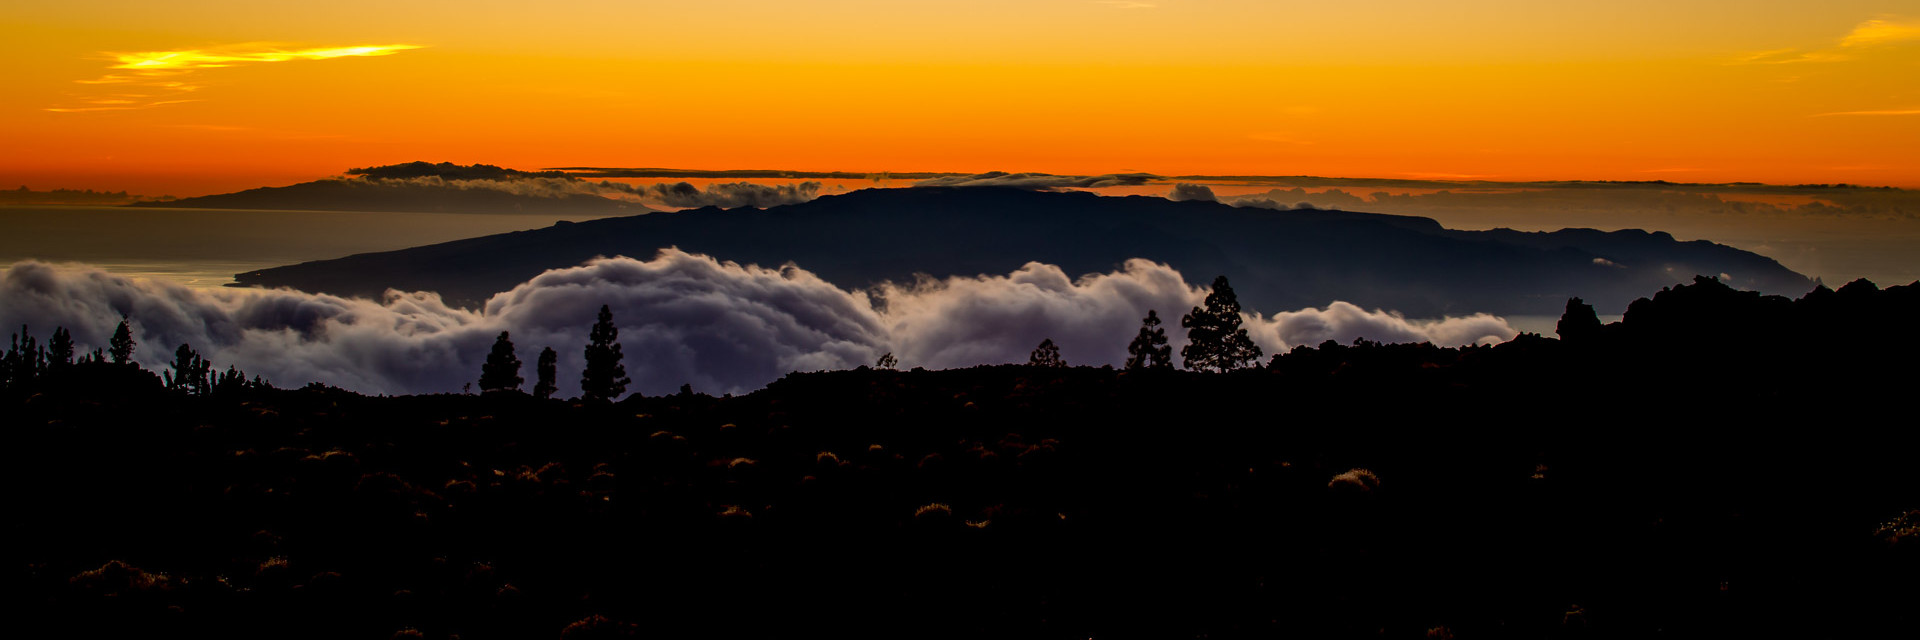 14.11. Sonnenuntergang, Corona Forestal / Lava Negra